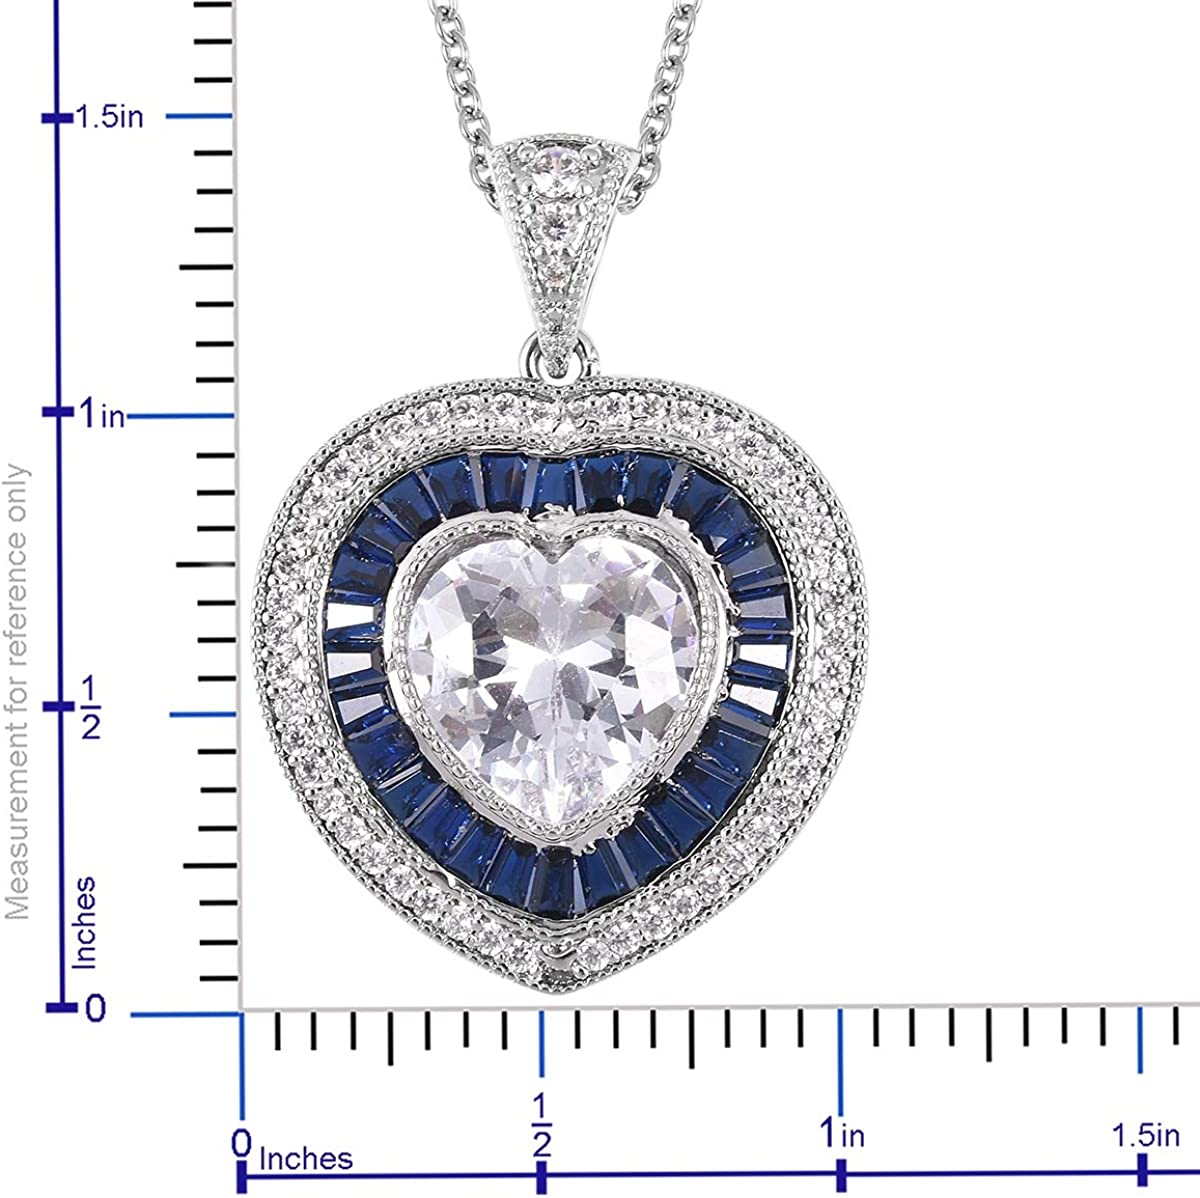 1.6 x 10 3//8 x 5 x 12 mm VOTREPIERCING Purple Strass 925 Silver /& 316L Steel Bowtie Belly Bar Navel Button Ring Piercing Jewel